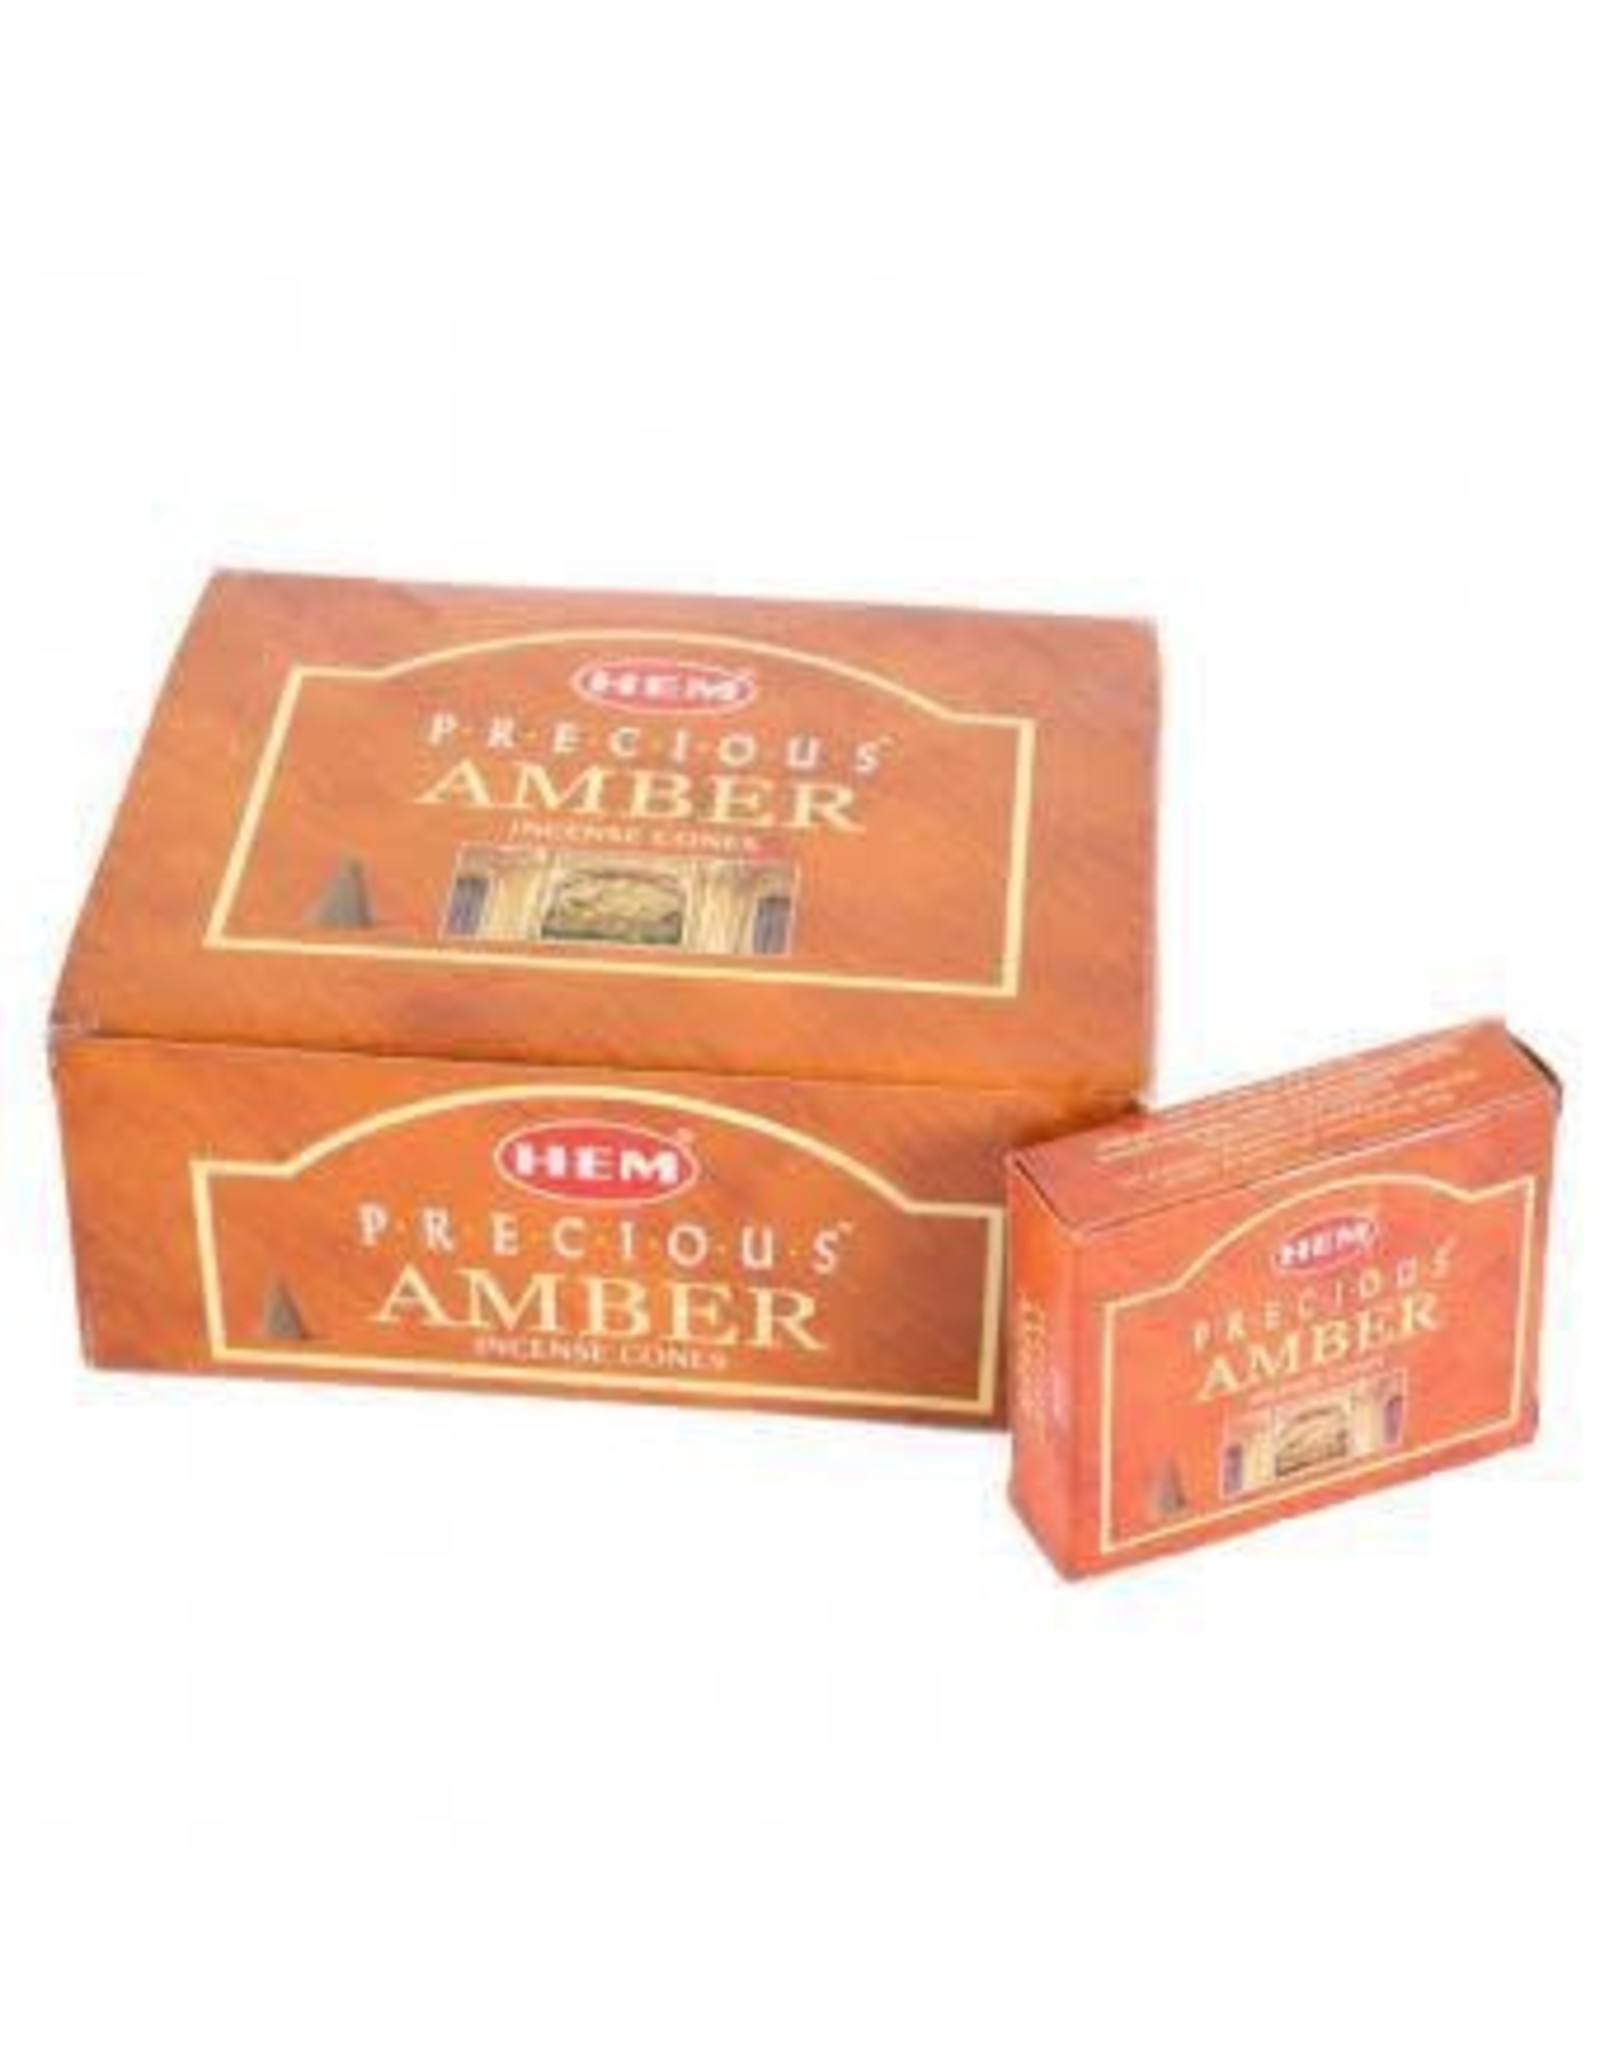 Benjamin Intl. Precious Amber HEM Incense Cones